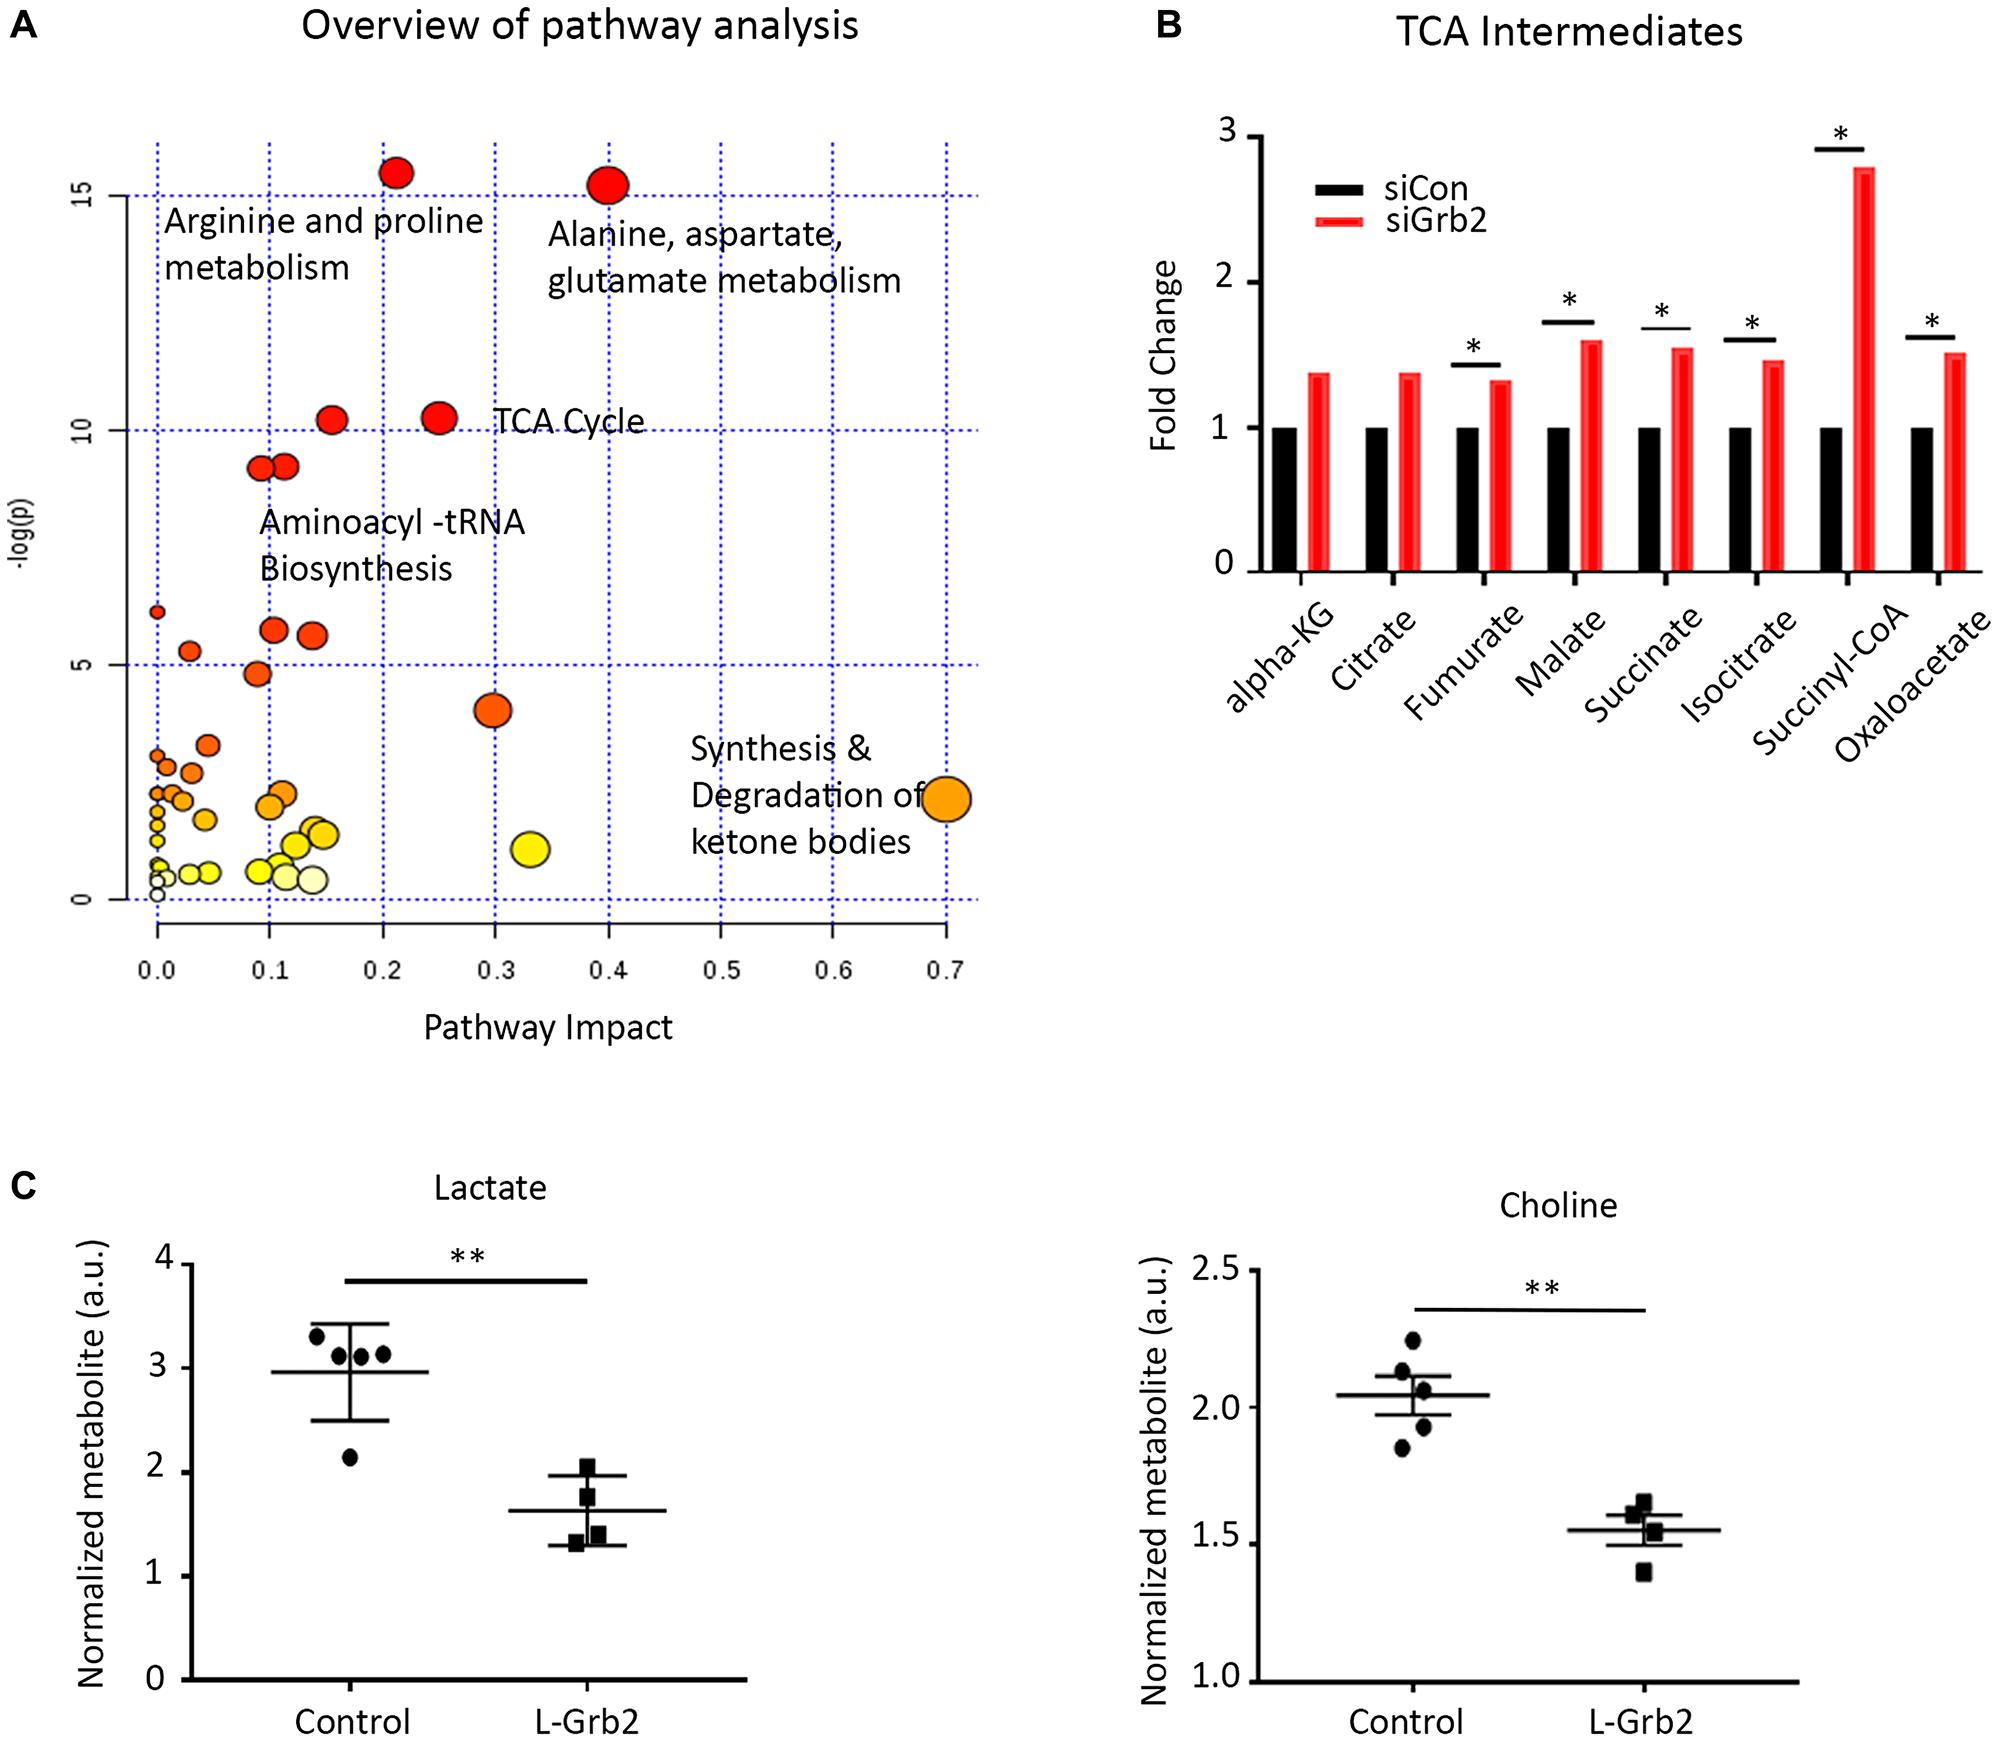 Effect of Grb2 downregulation on metabolite levels in ovarian cancer cells.